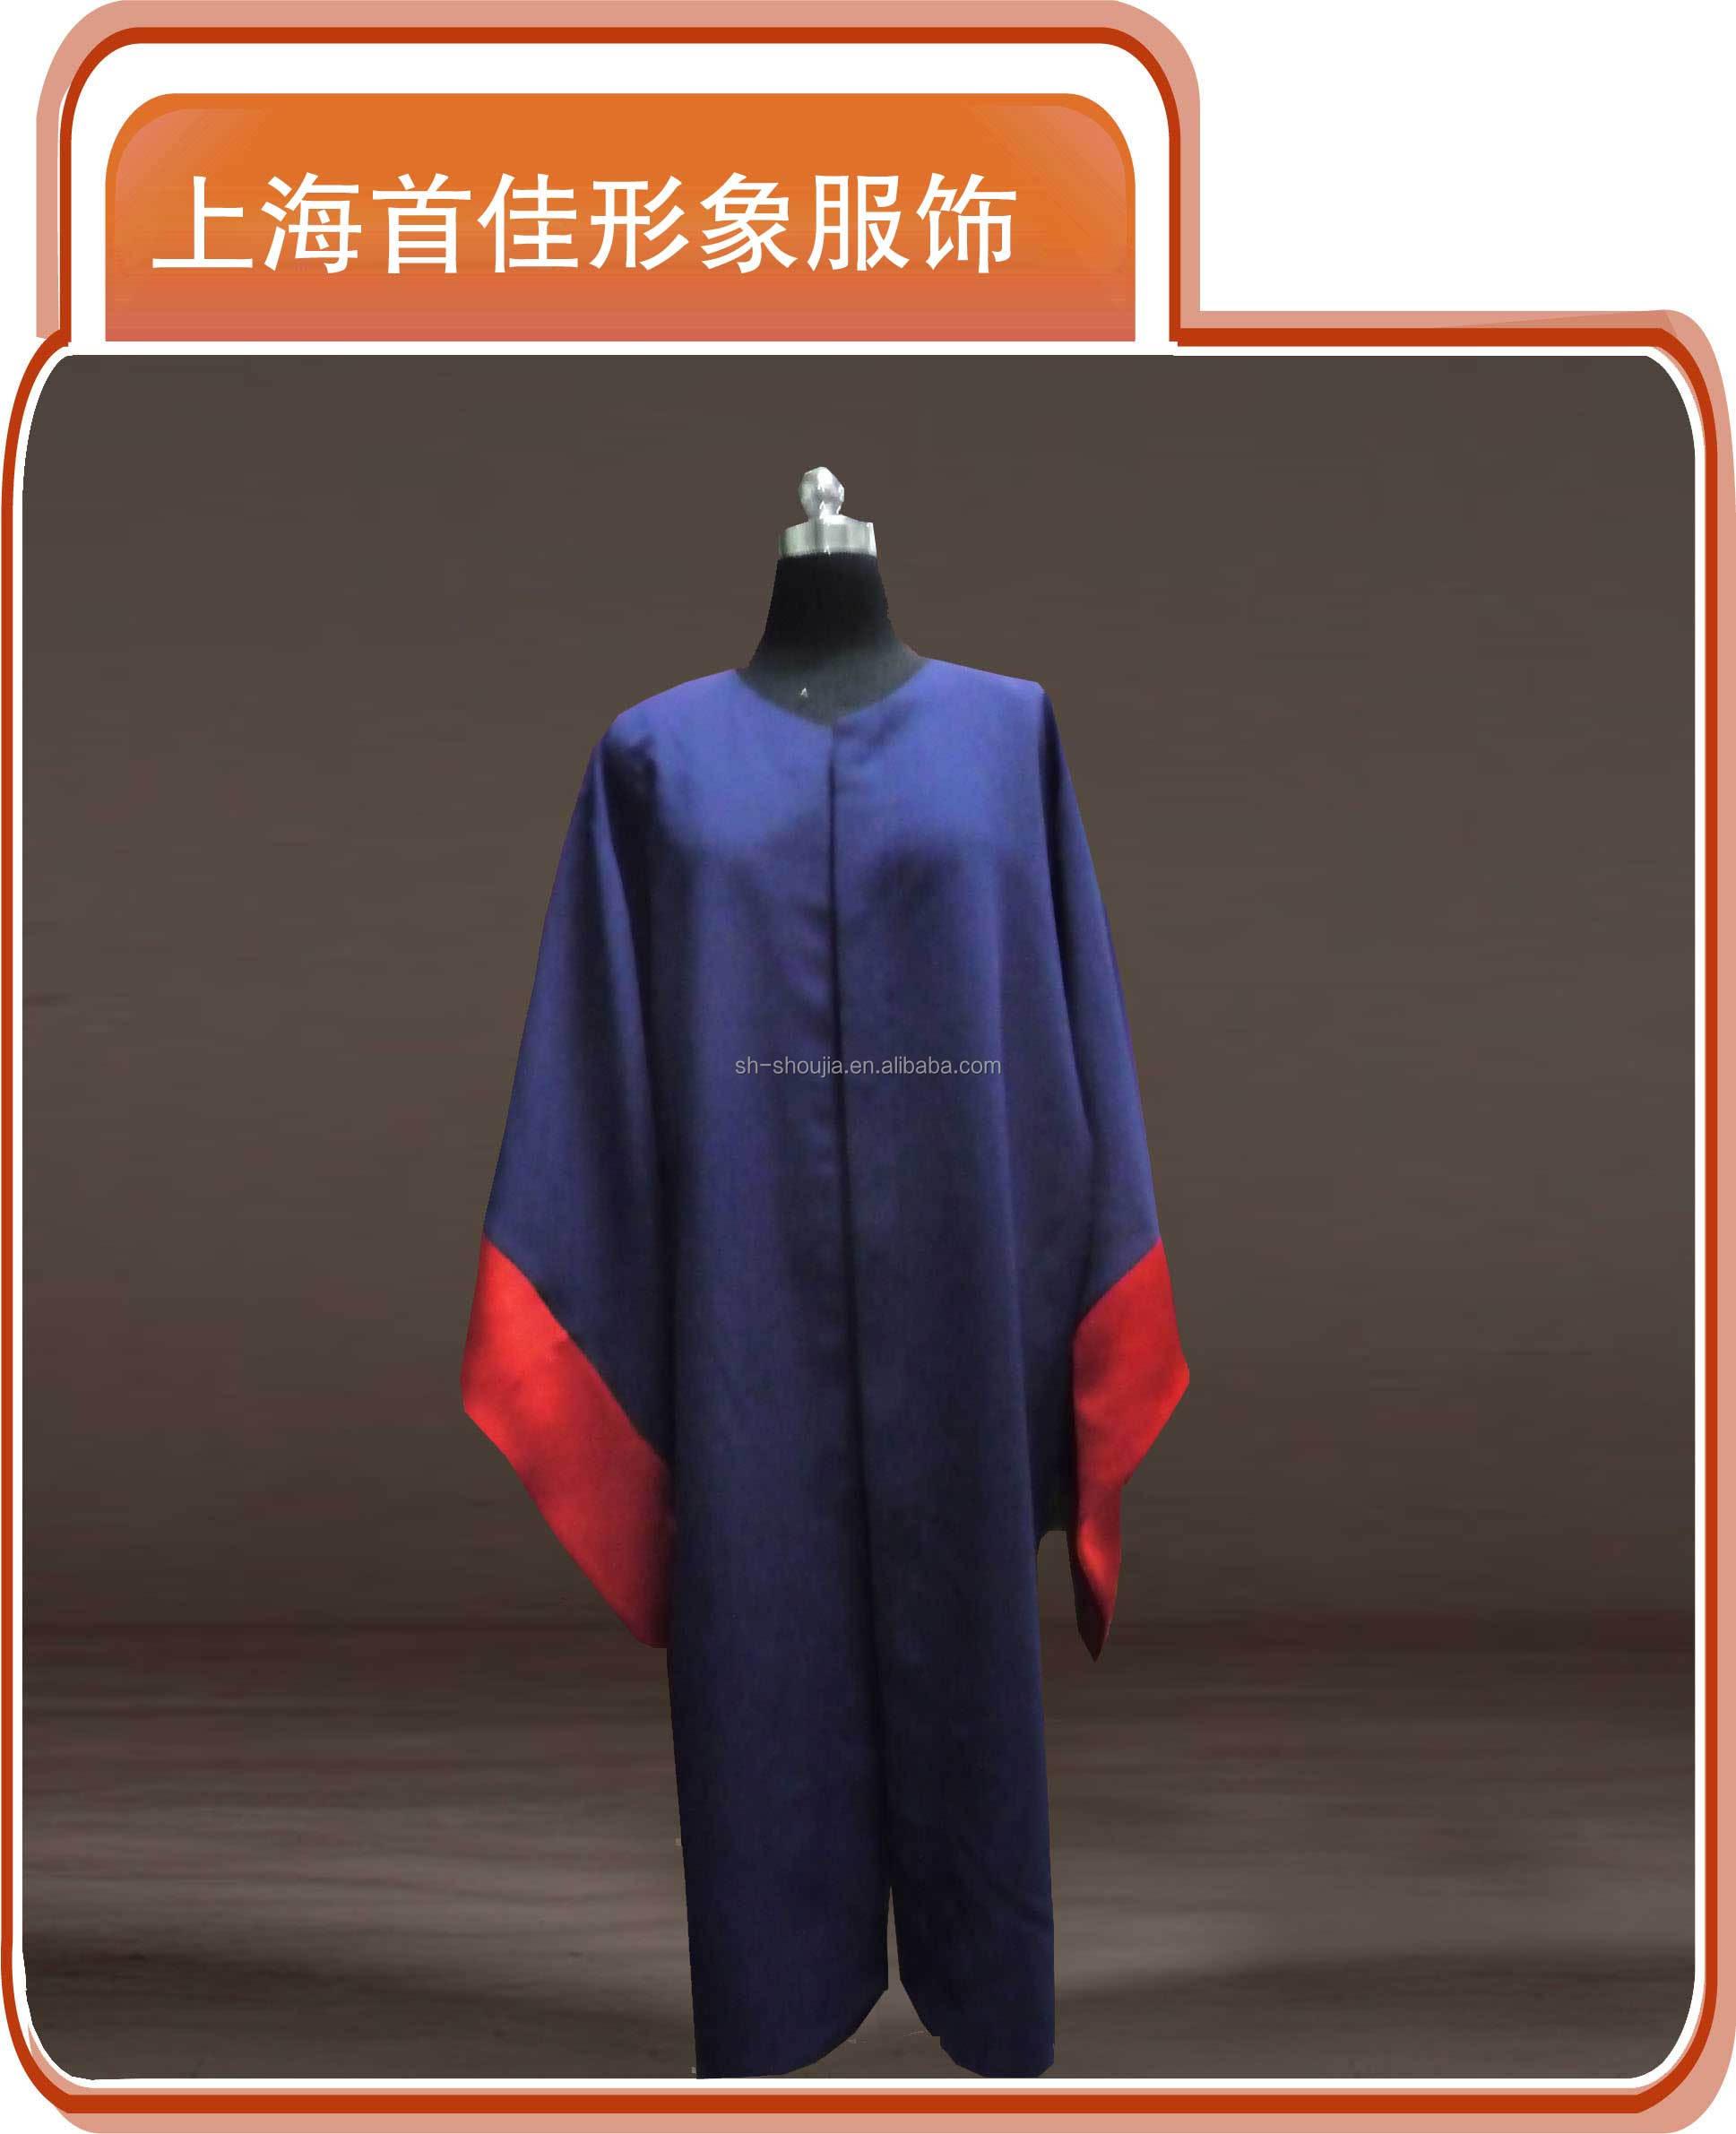 Doctor Graduation Gown,Graduation Apparel,Doctor\'s Gown - Buy Doctor ...